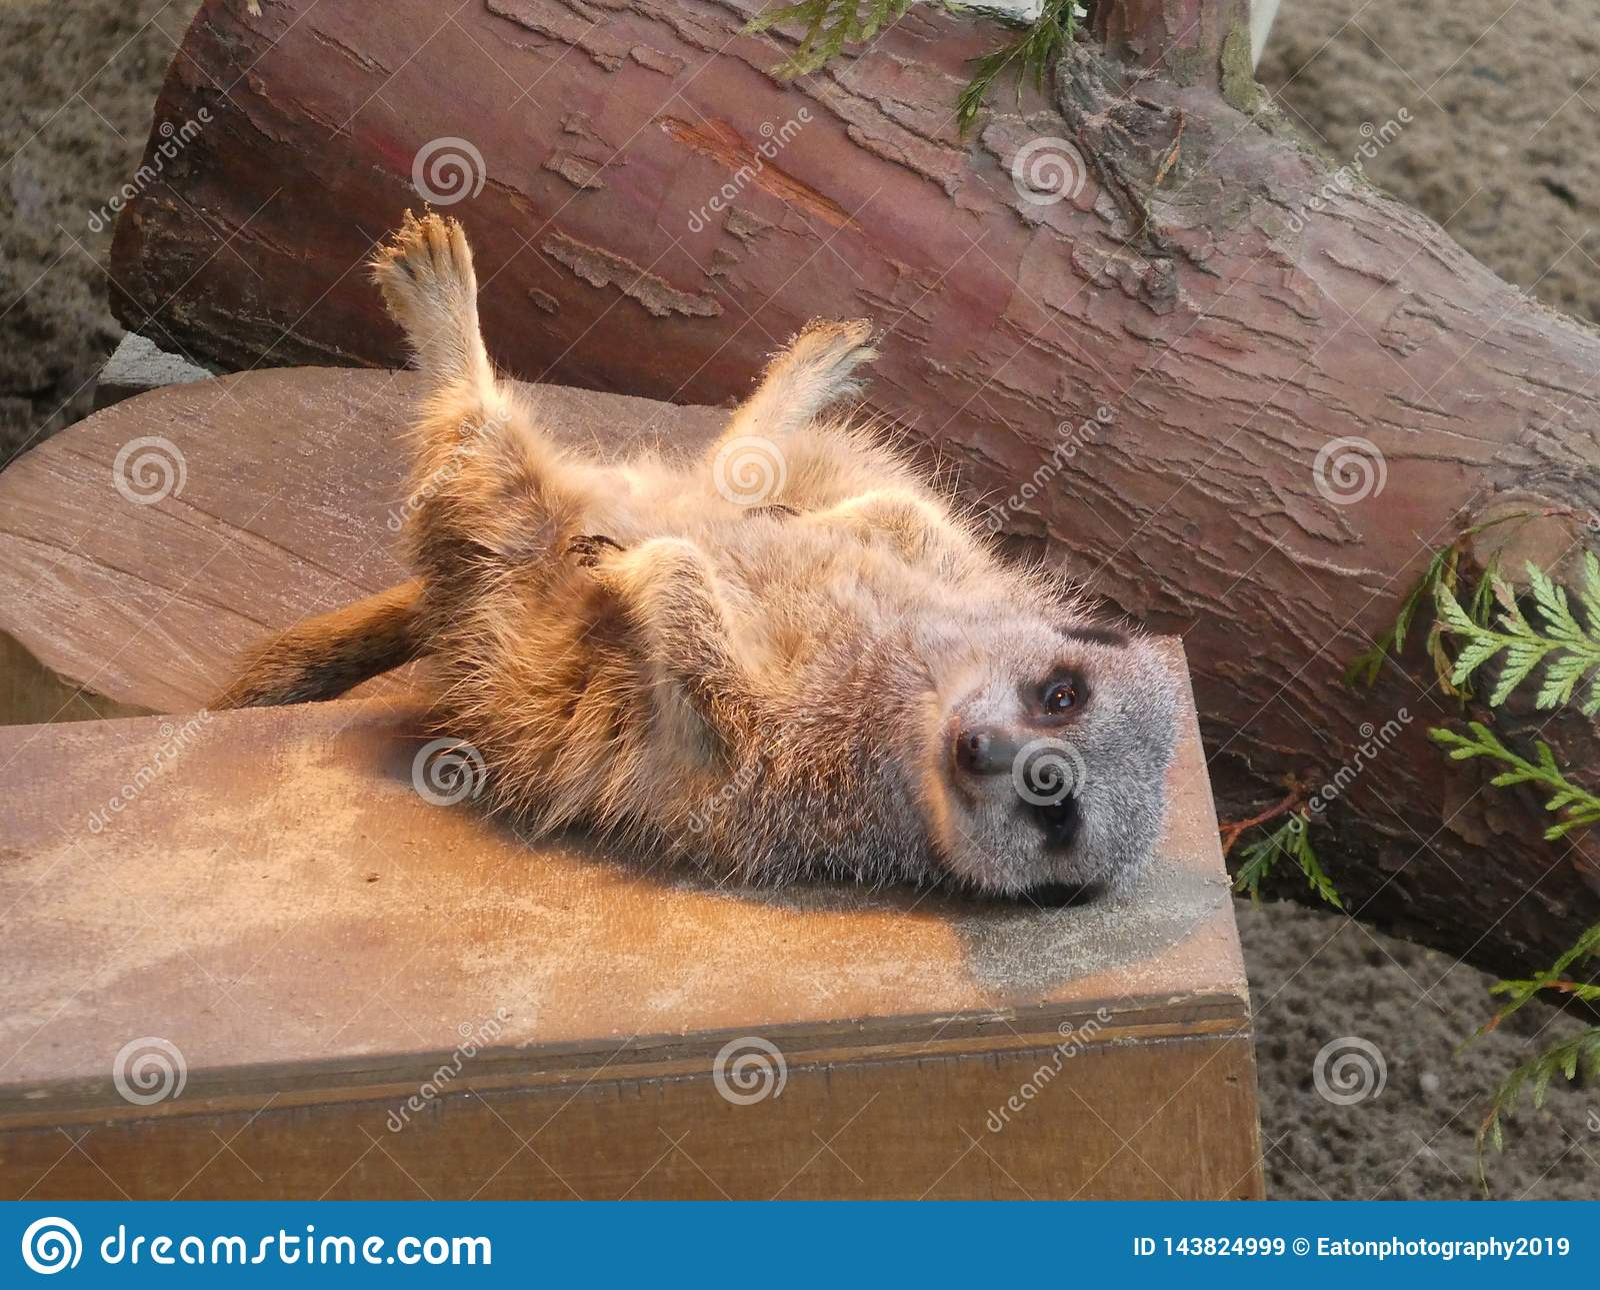 Meerkat sitting in the sun